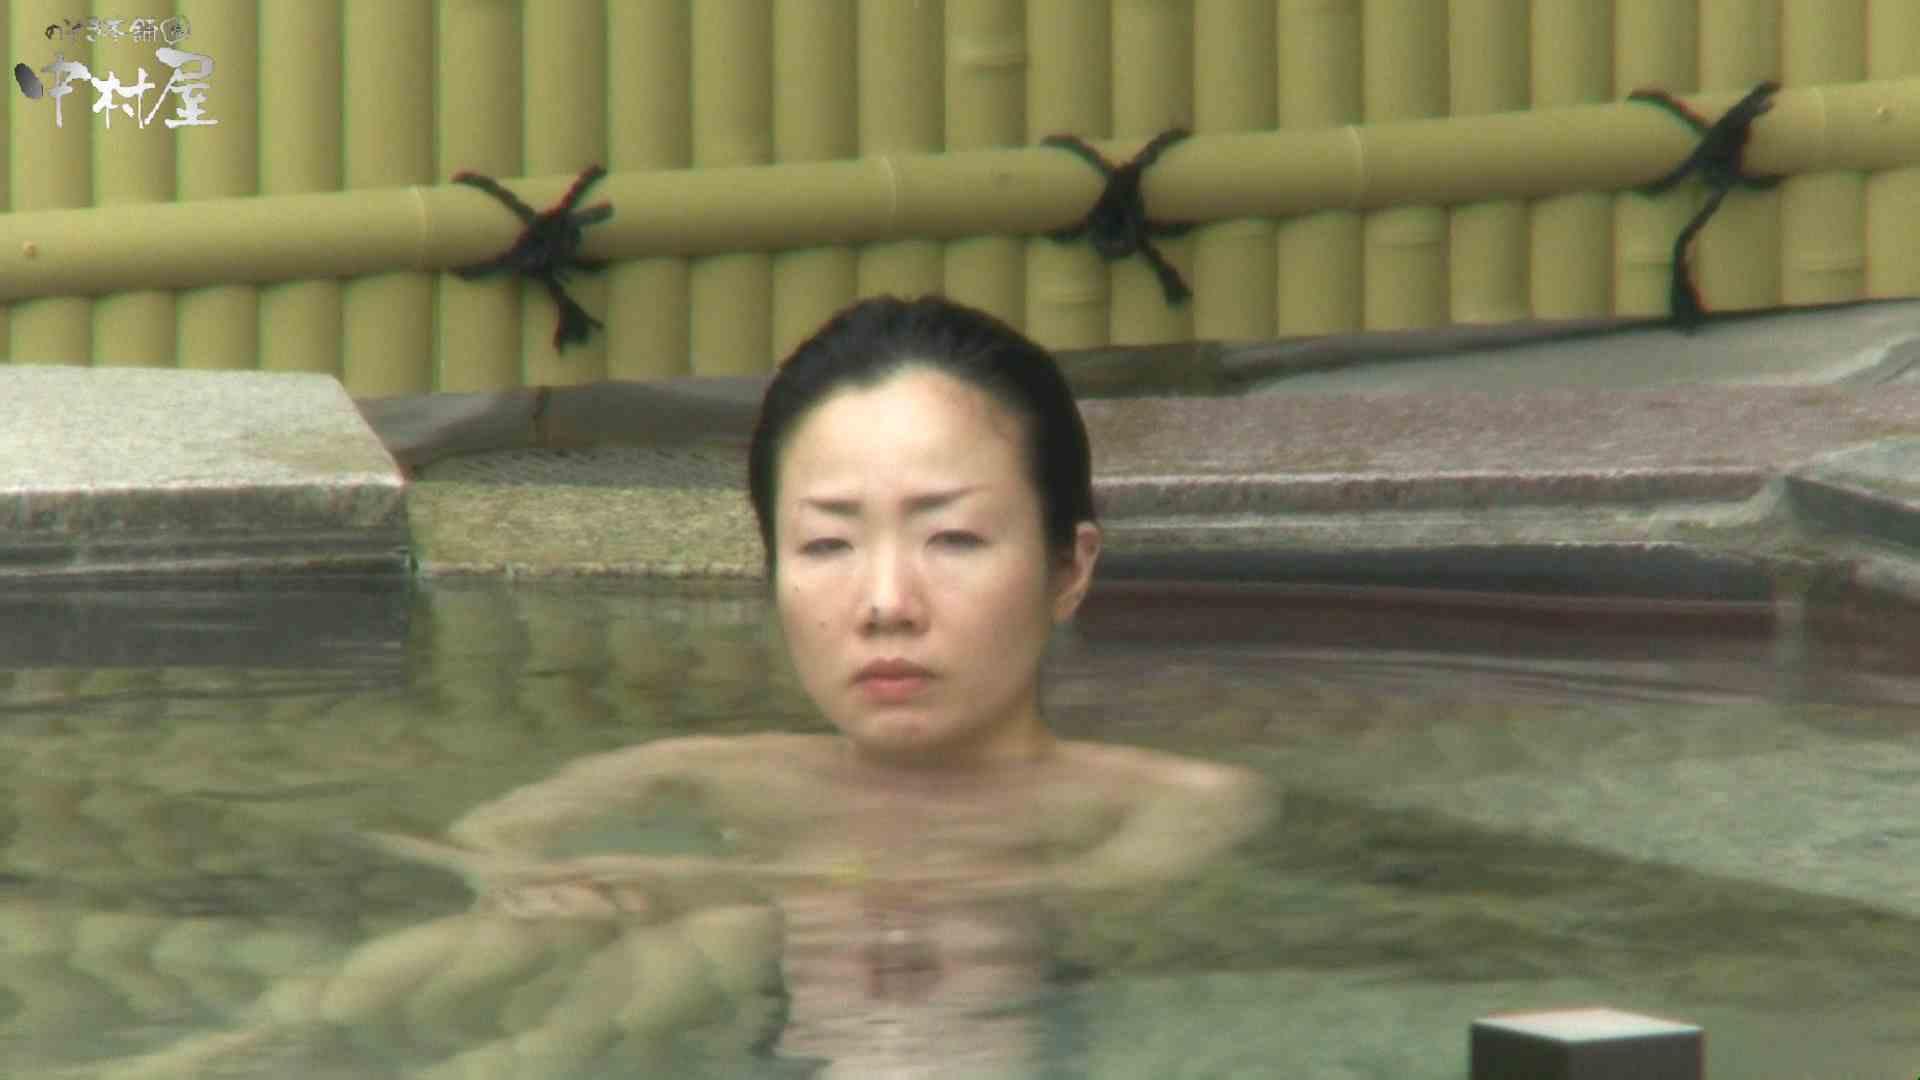 Aquaな露天風呂Vol.950 美しいOLの裸体 | 露天風呂突入  75pic 31